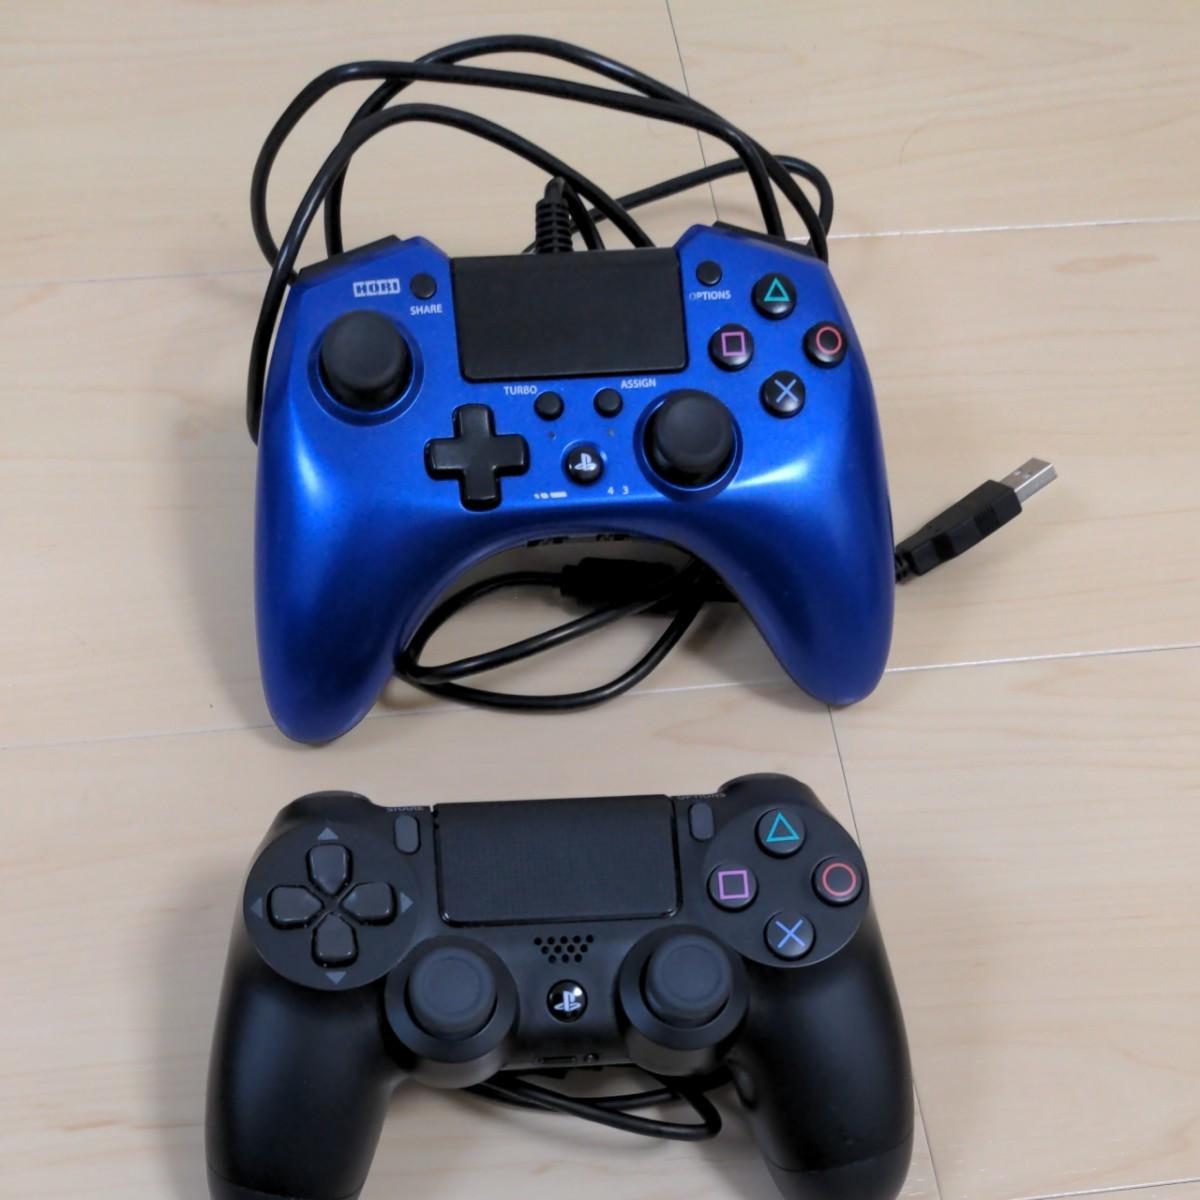 PS4 Pro CUH-7200B SSD 2TB換装済 連コン付 PlayStation4 プレイステーション4